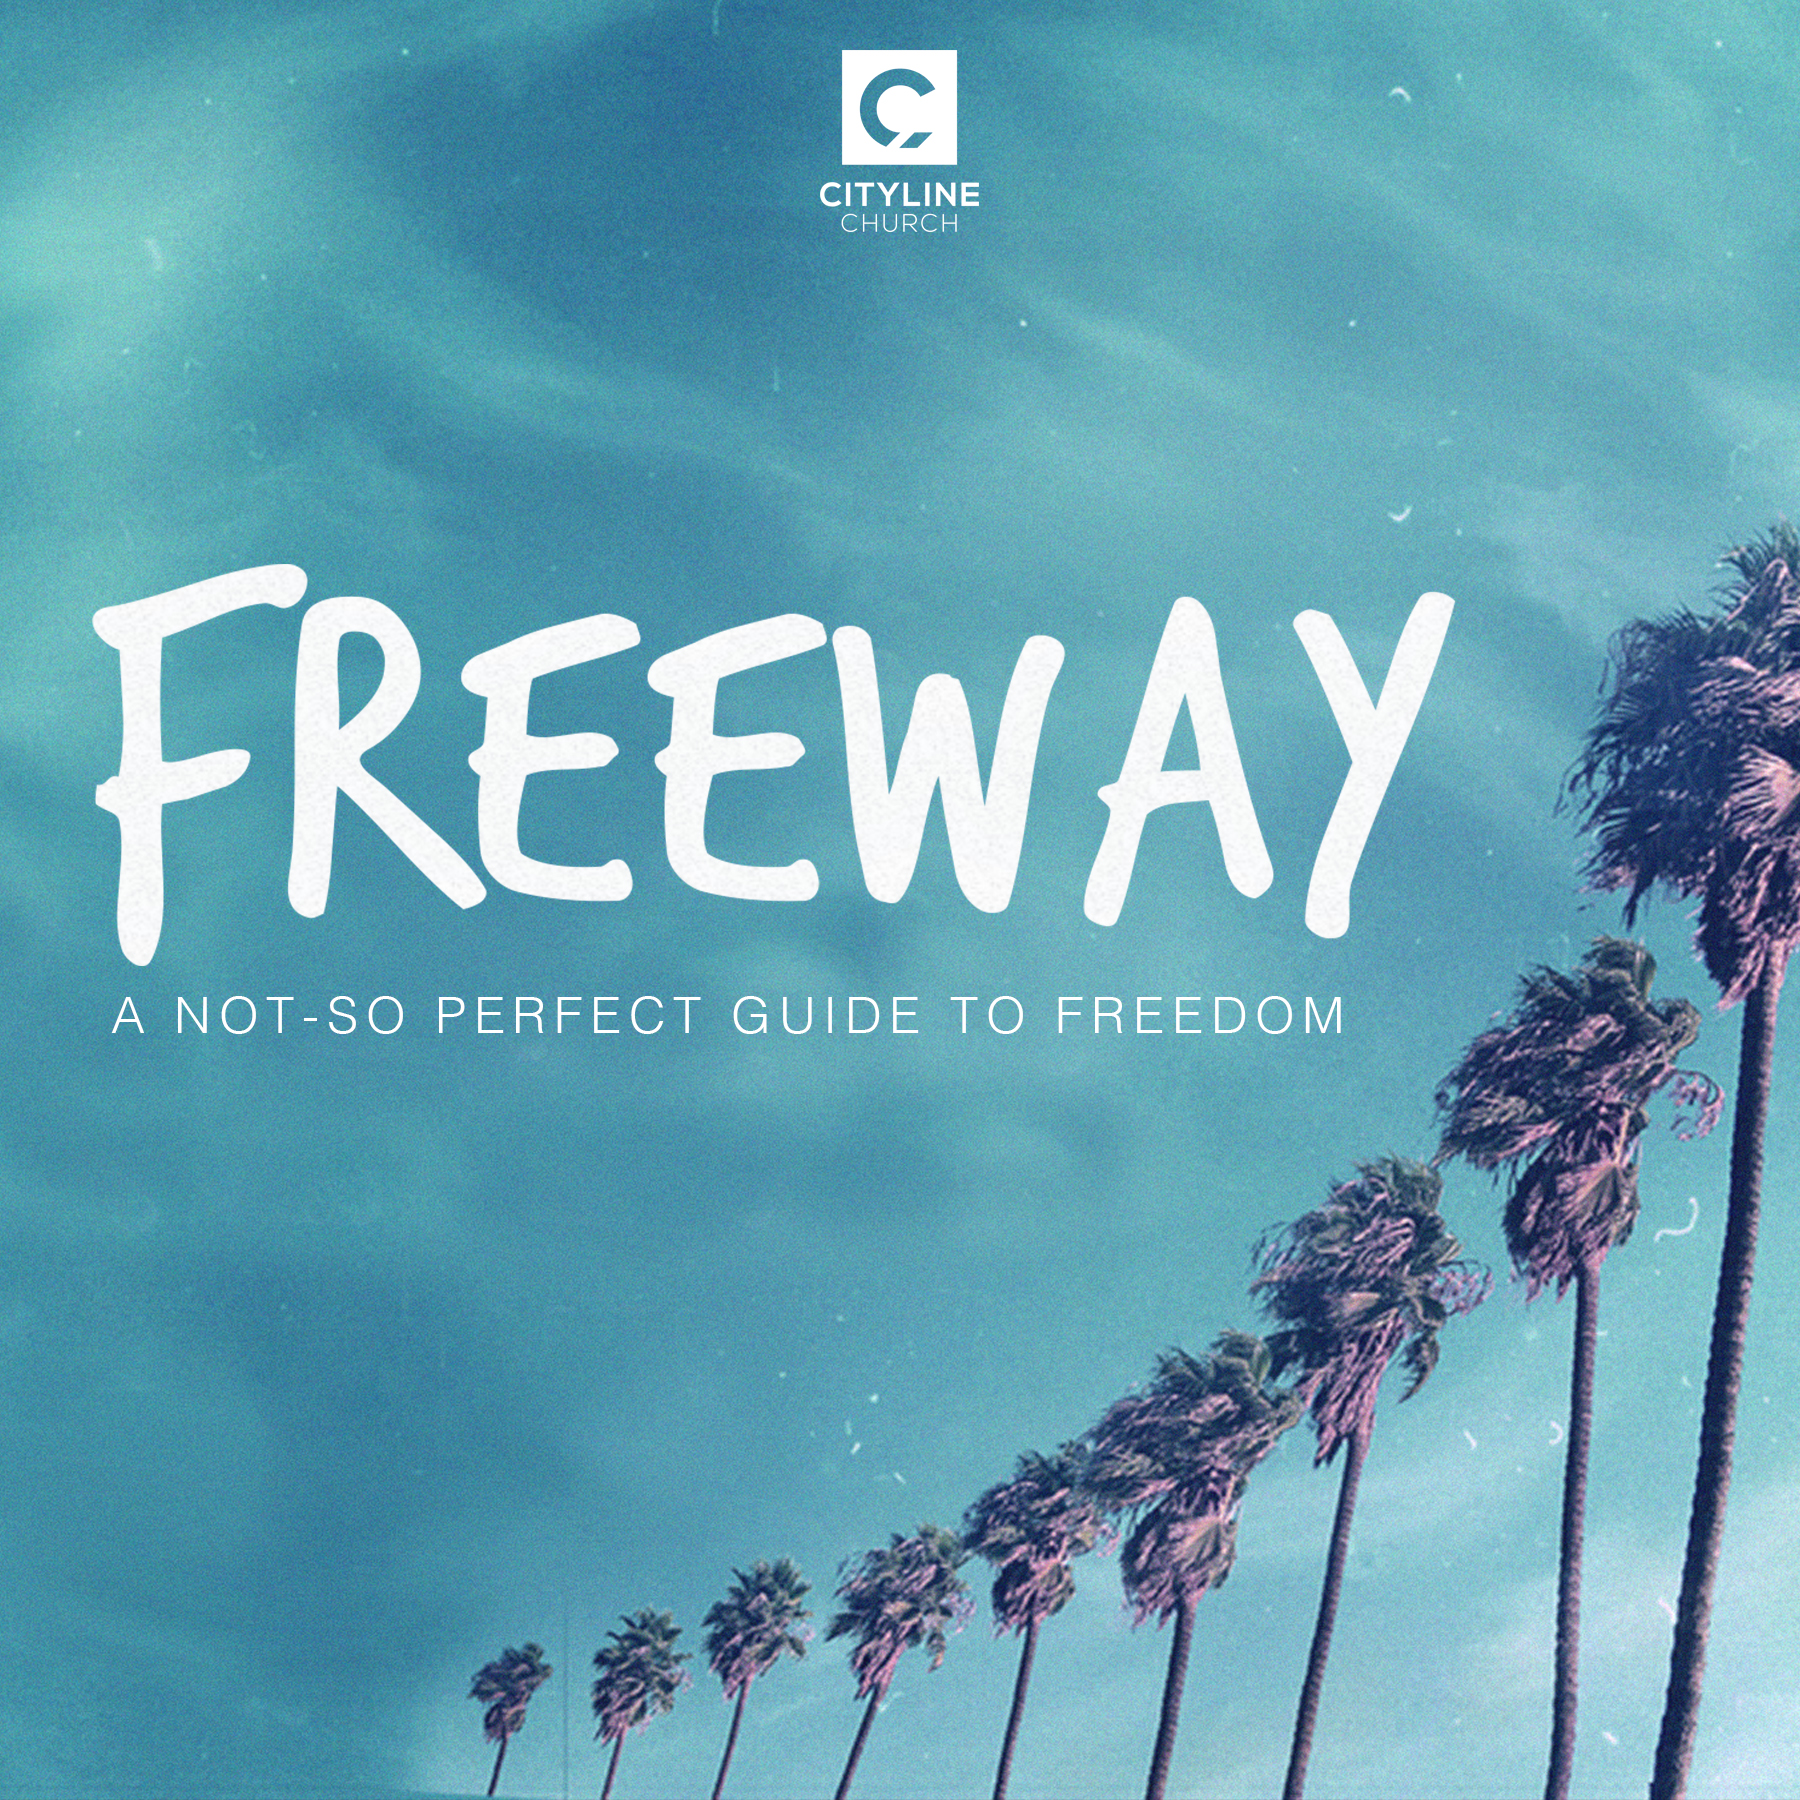 Freeway_IG.jpg